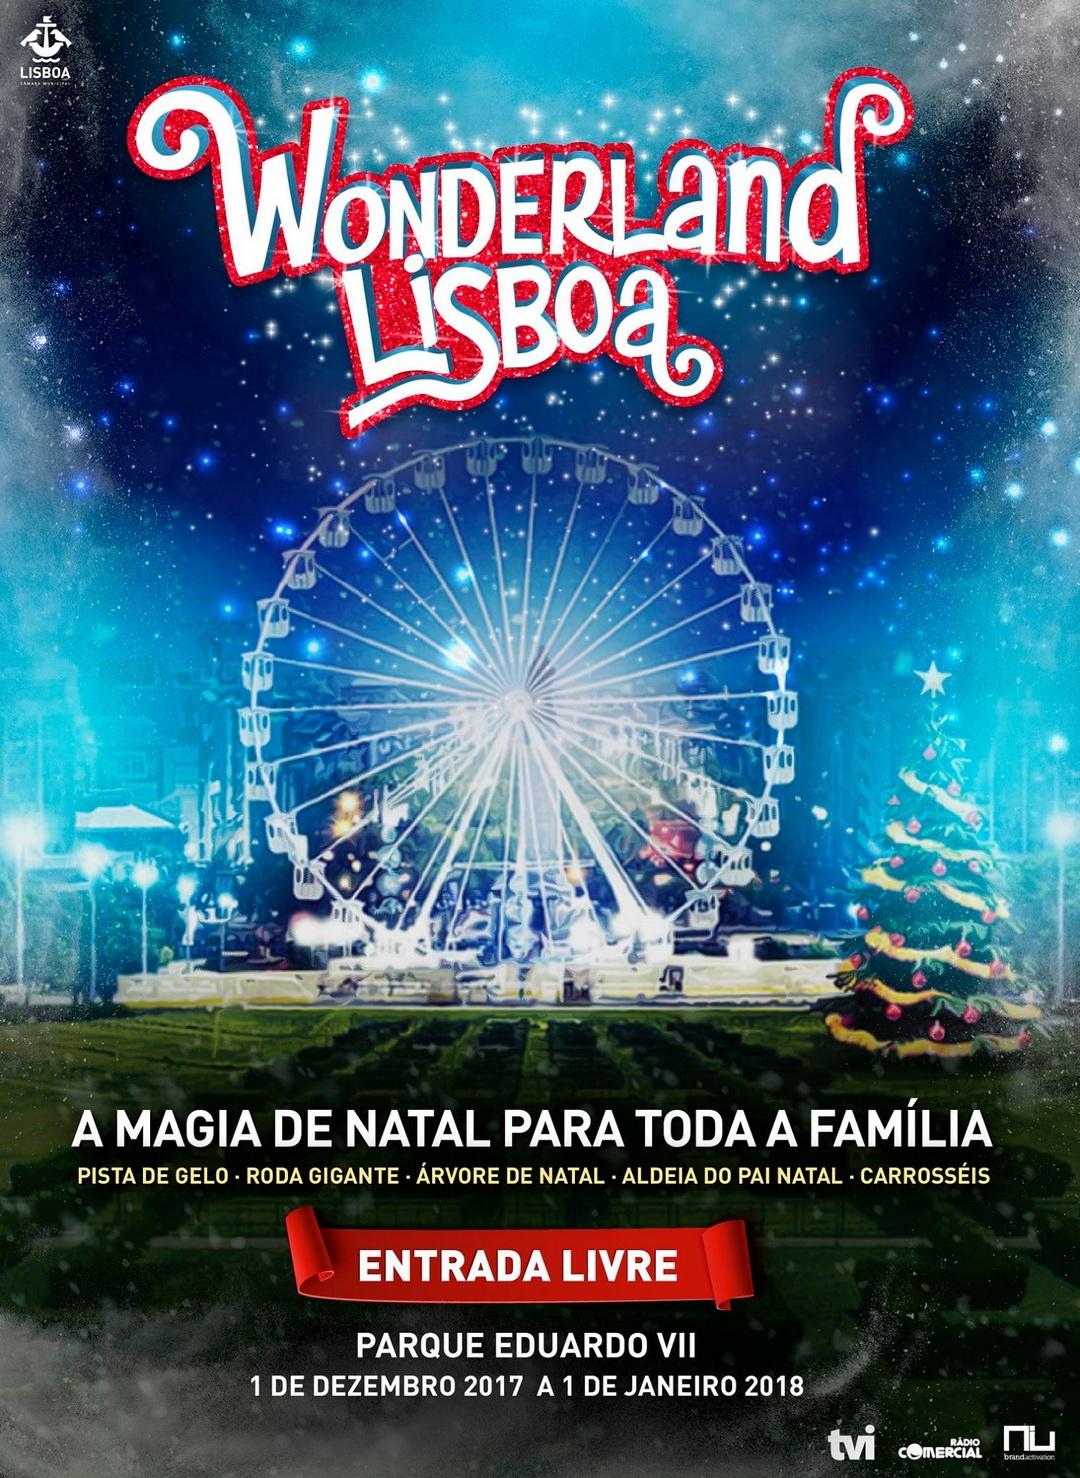 Wonderland Lisboa 2017